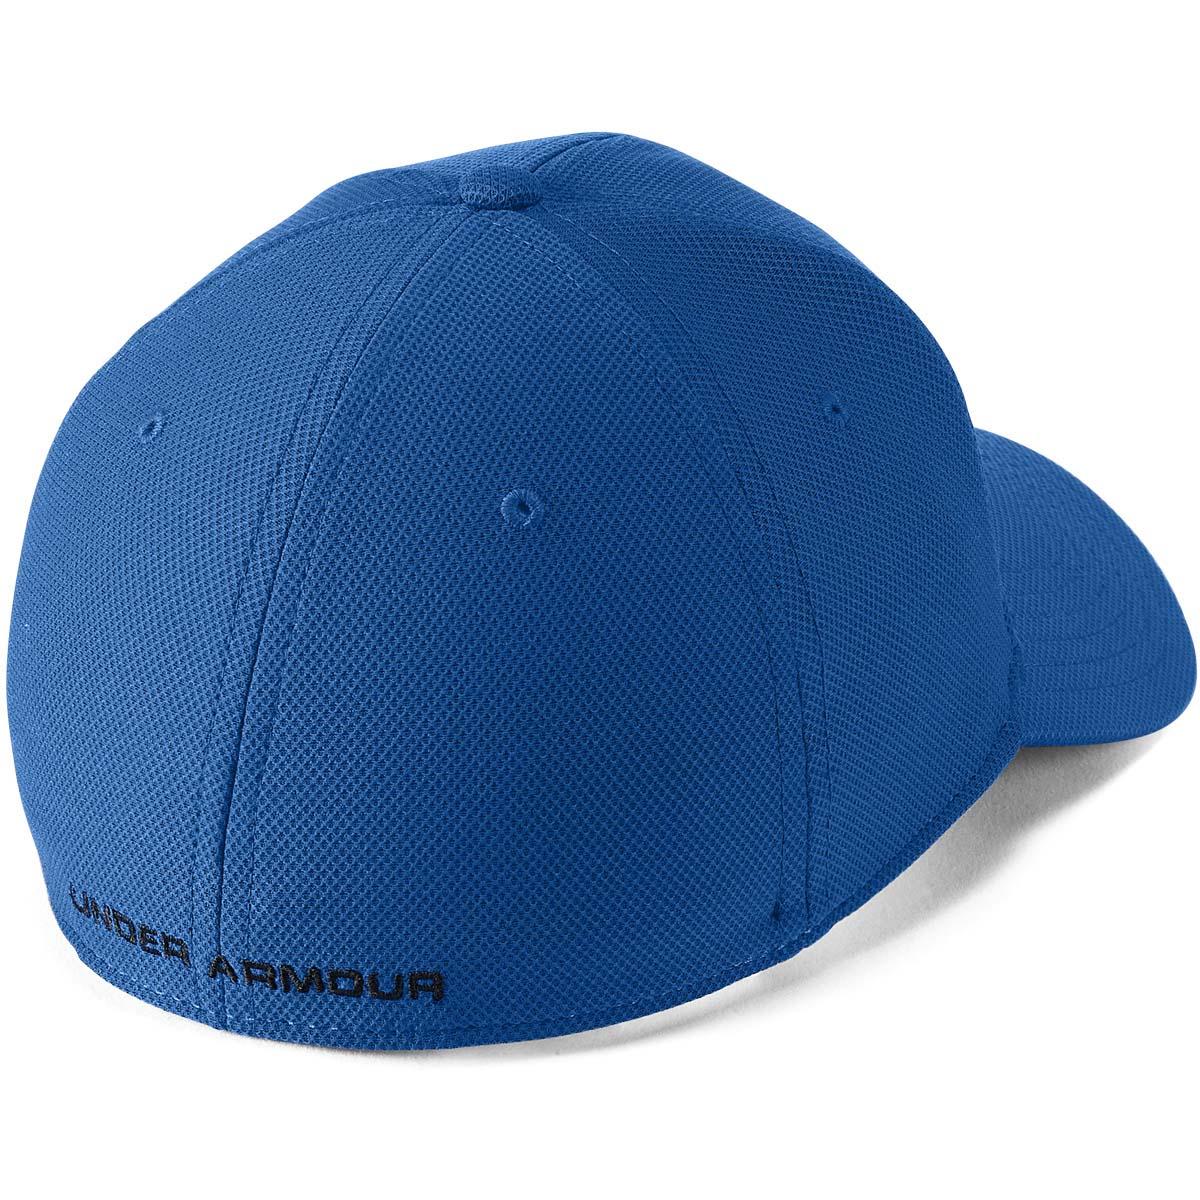 Under-Armour-Mens-Blitzing-3-0-Golf-Stretch-Fit-Curved-Peak-Hat-Cap